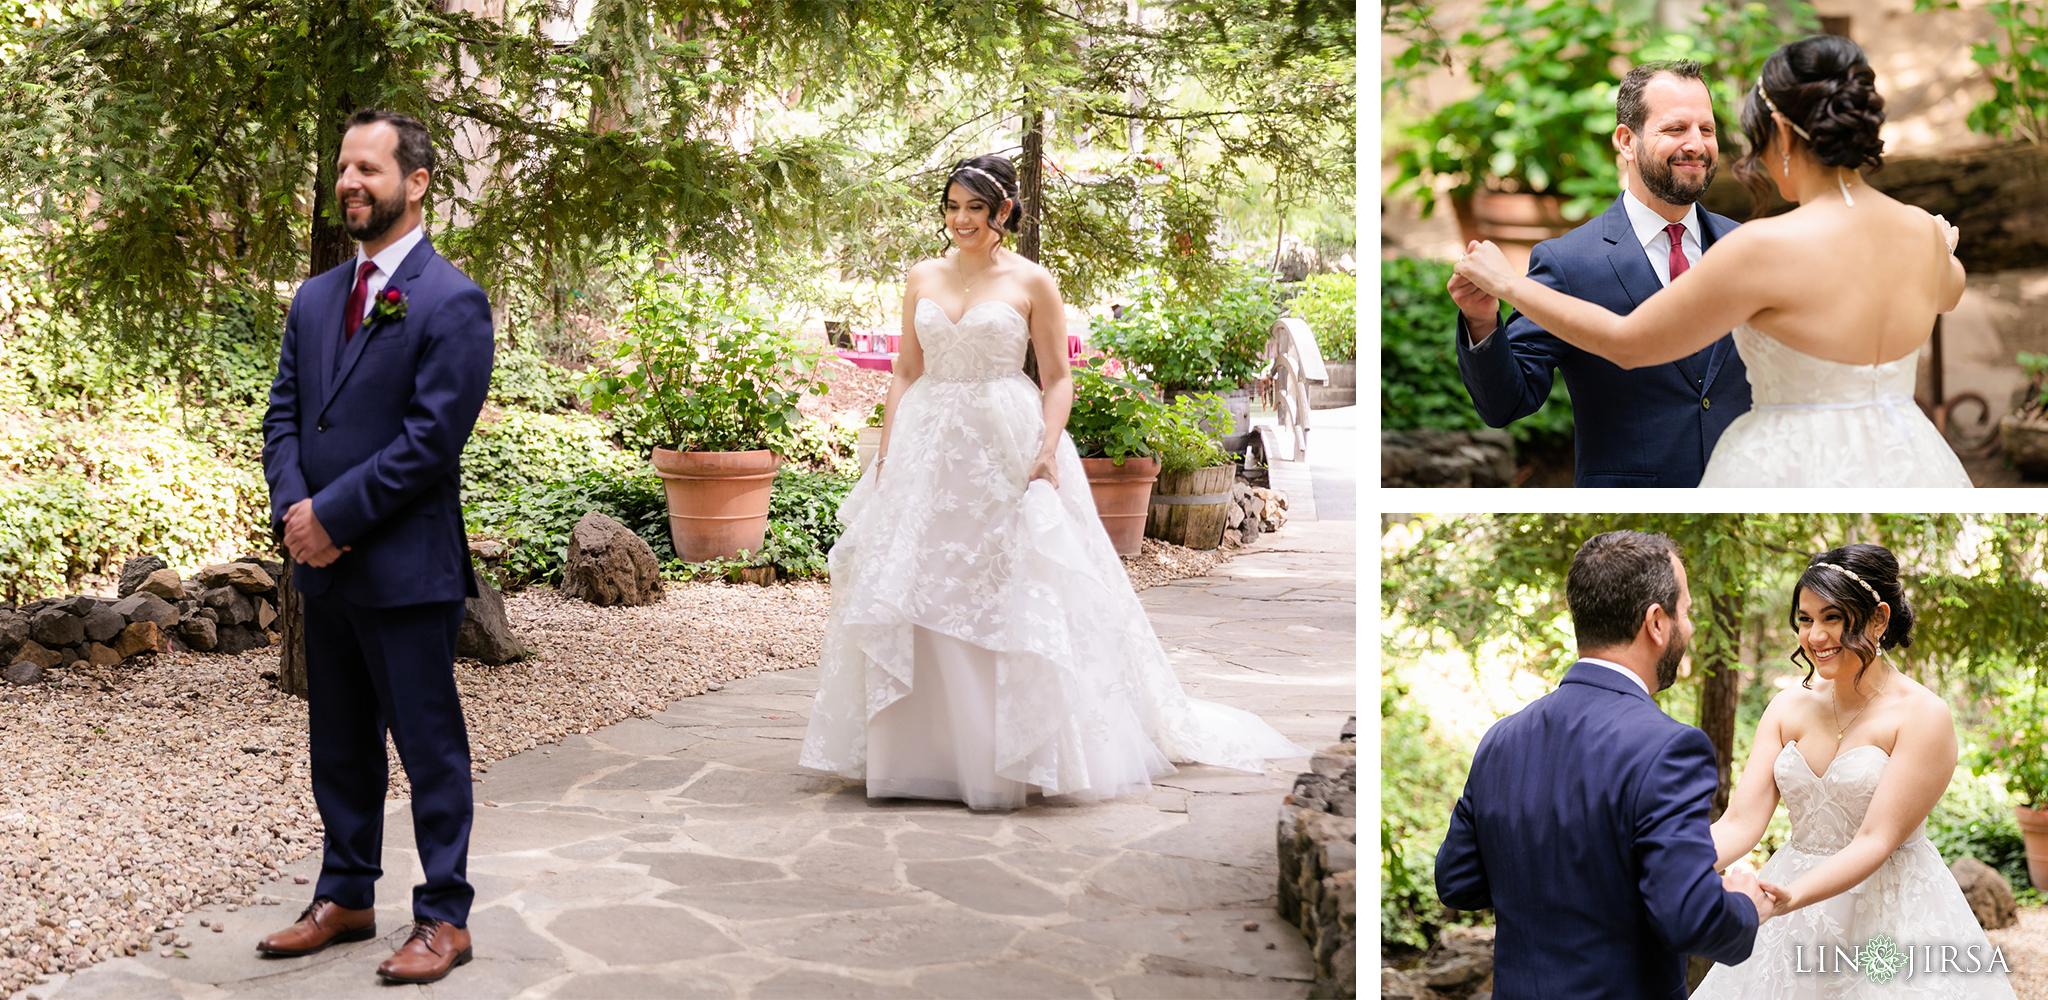 10 Calamigos Rancho Malibu Wedding Photography